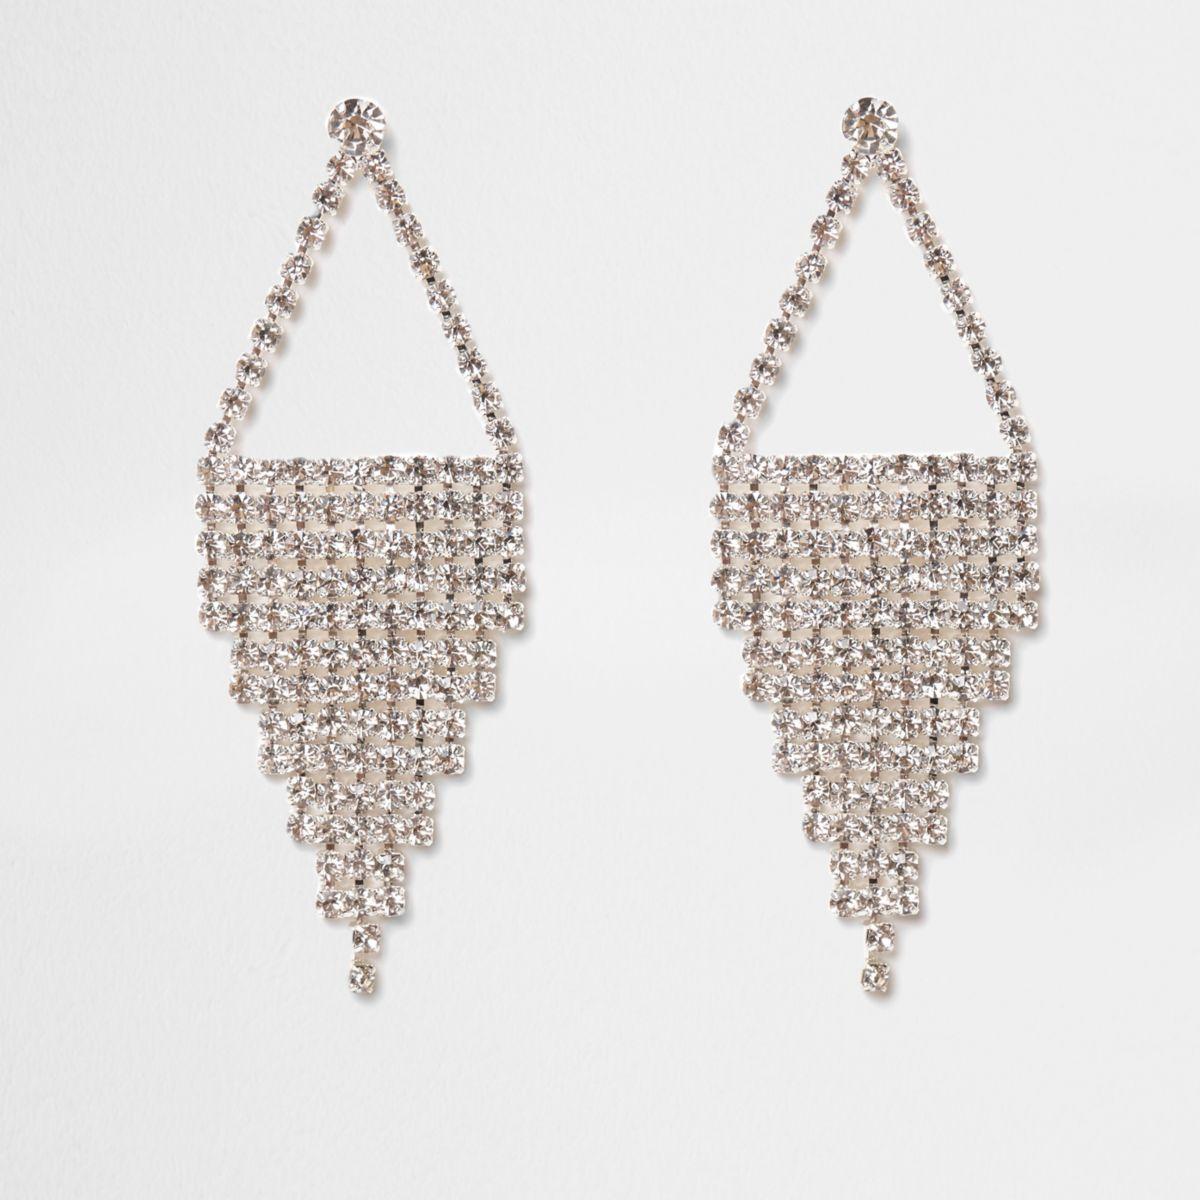 Silver tone cup chain dangle earrings